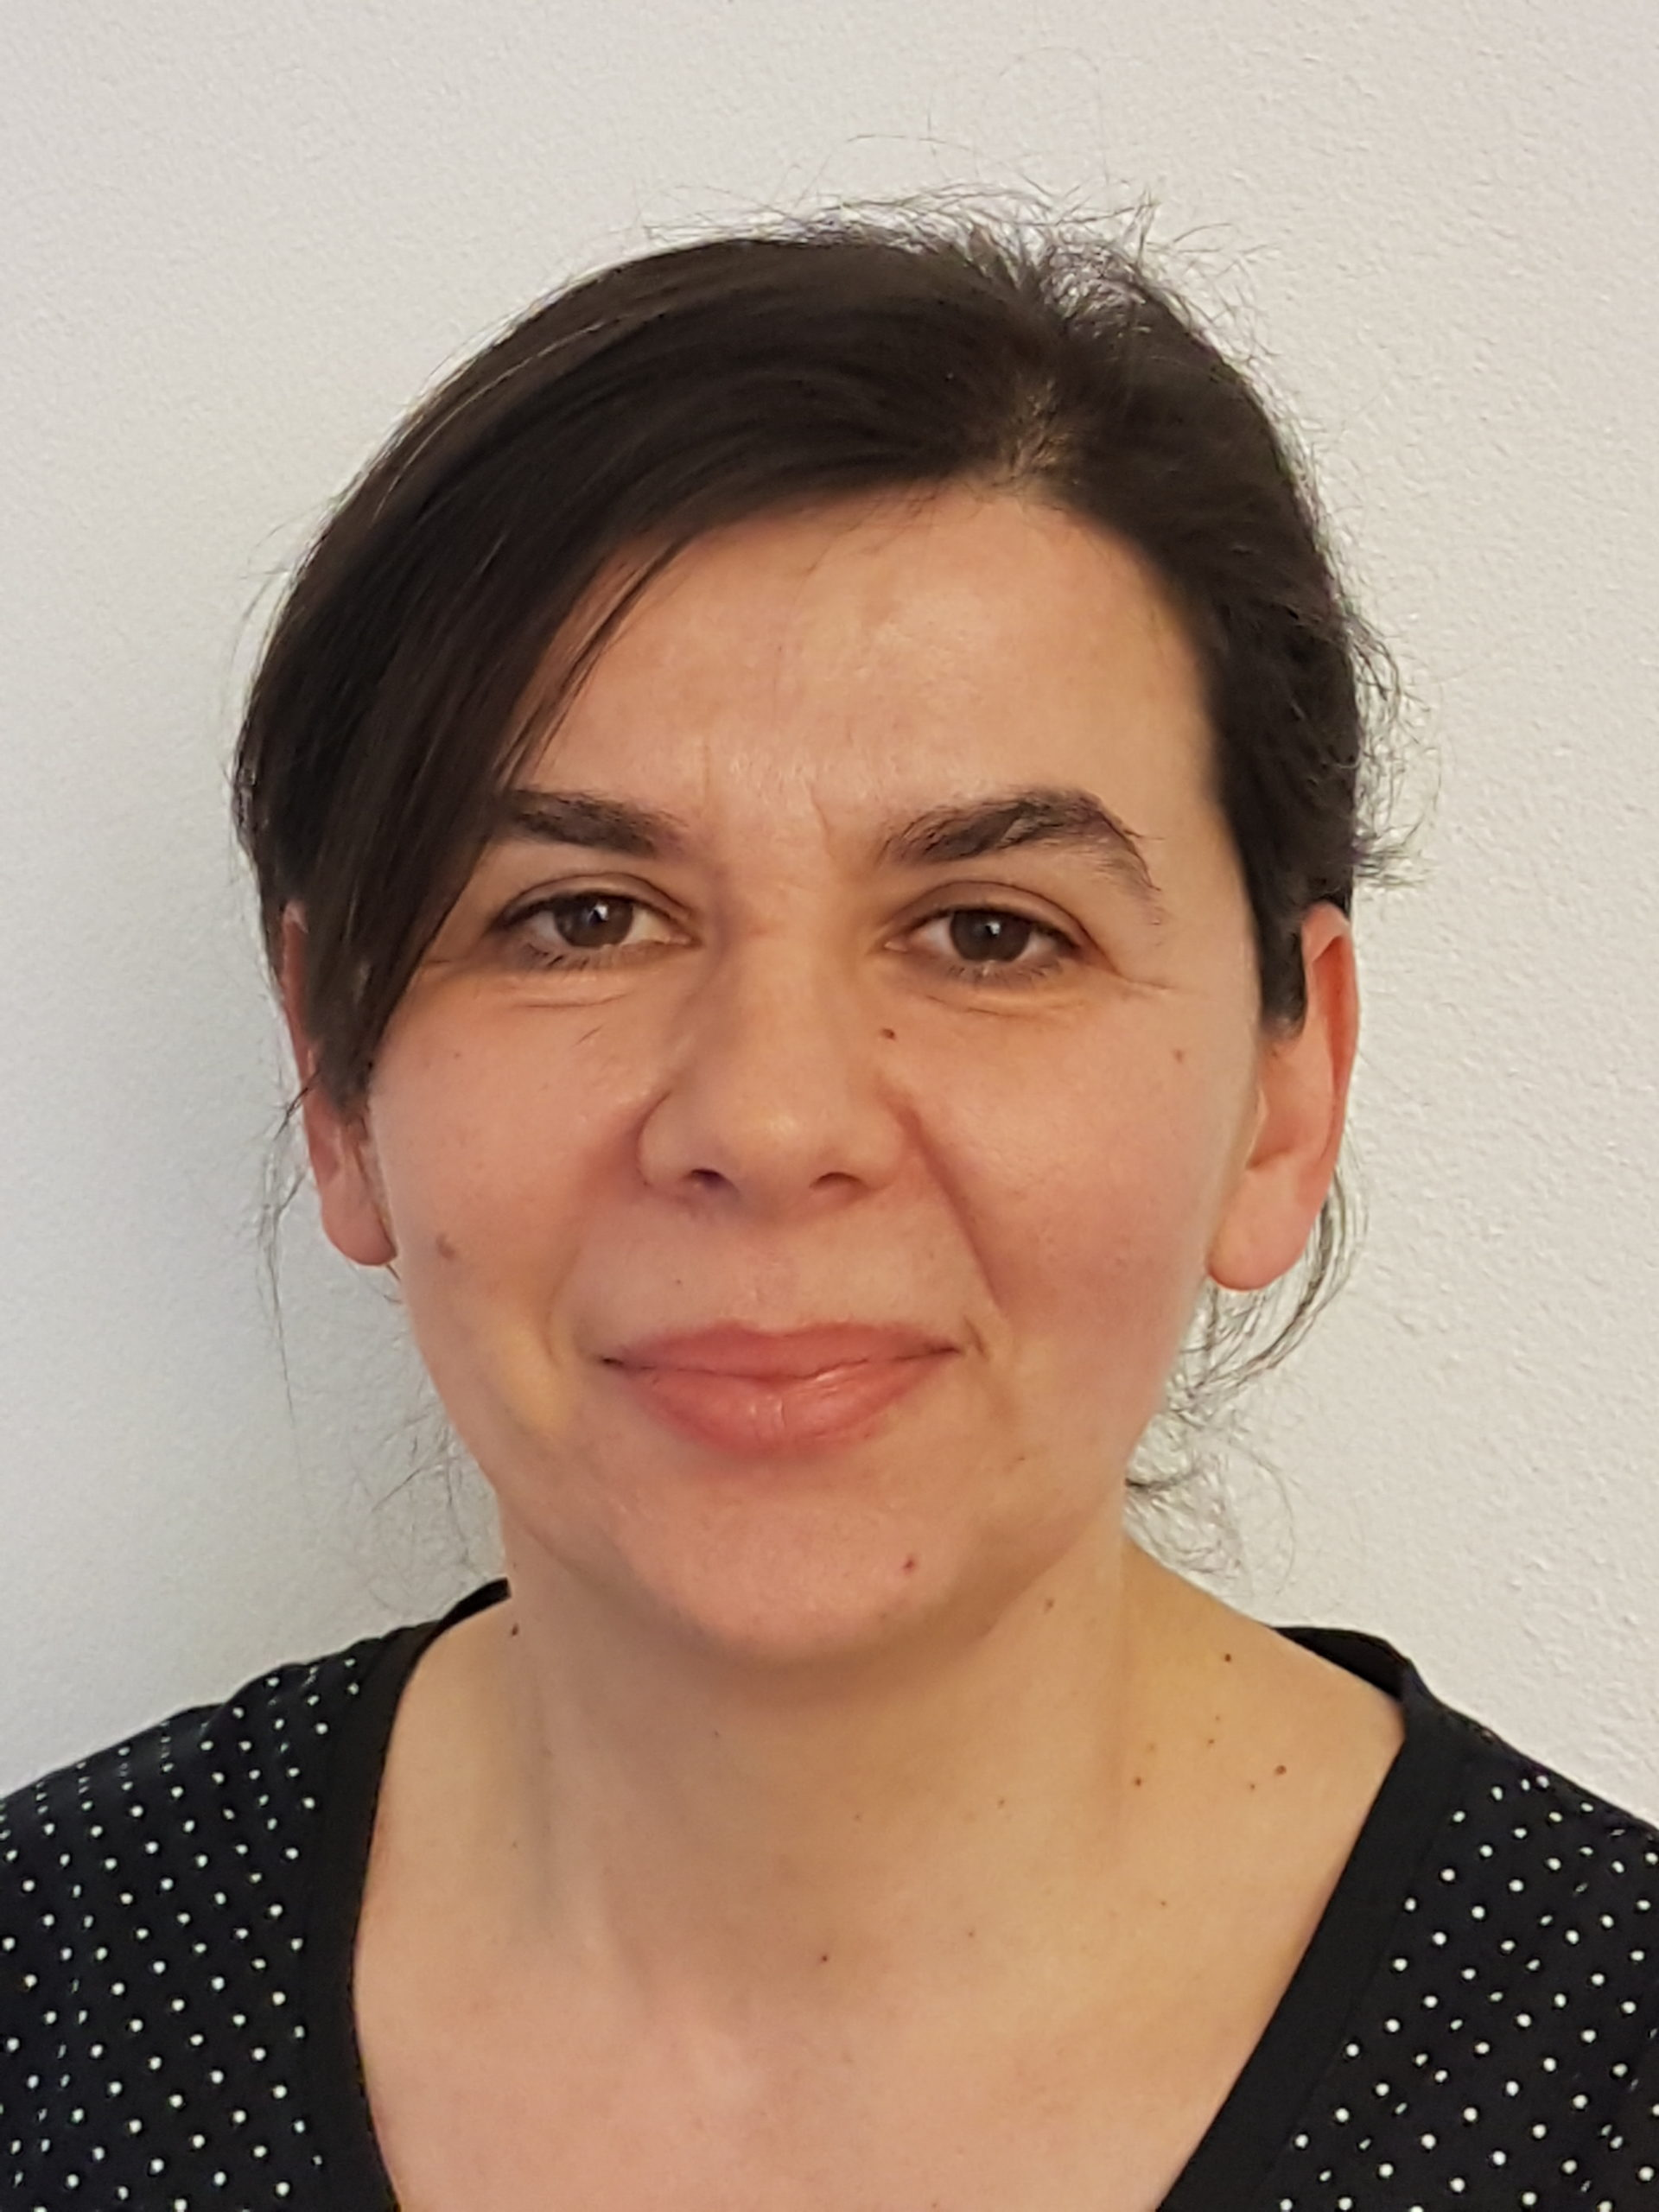 Ankica Gagulic